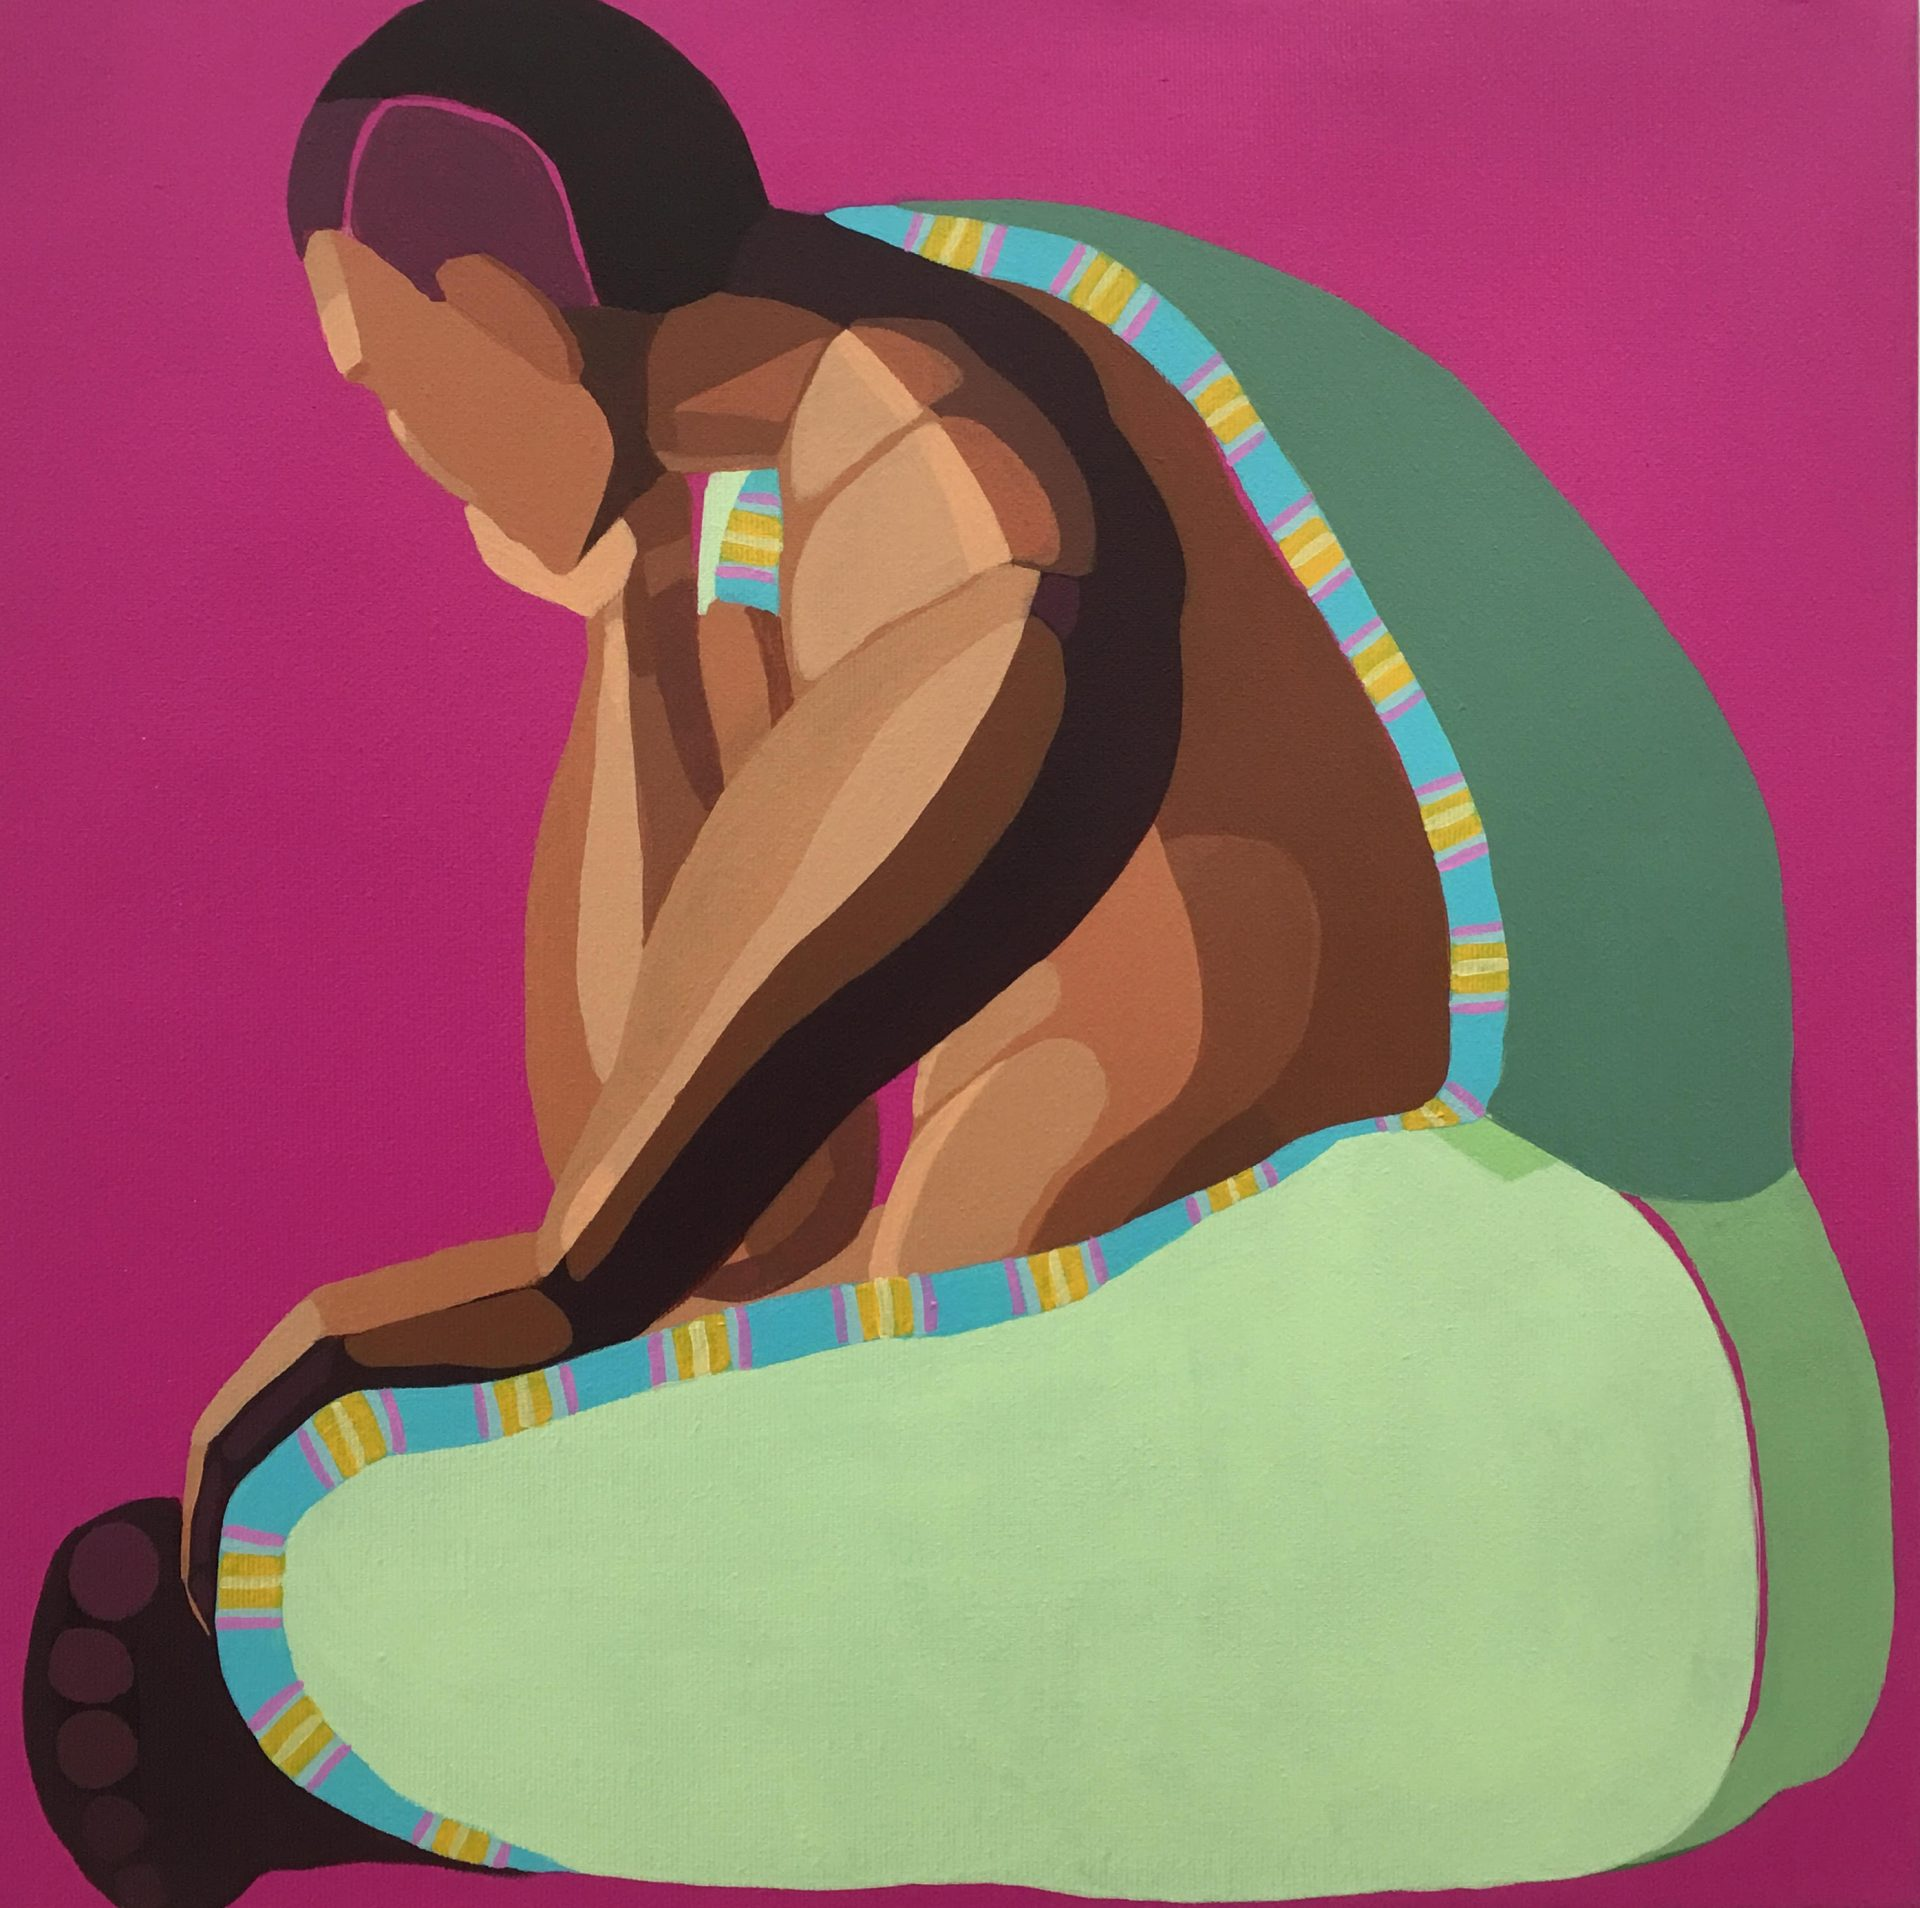 Nirit Takele,Sitting figure,2019,40x40 cm,$2,400